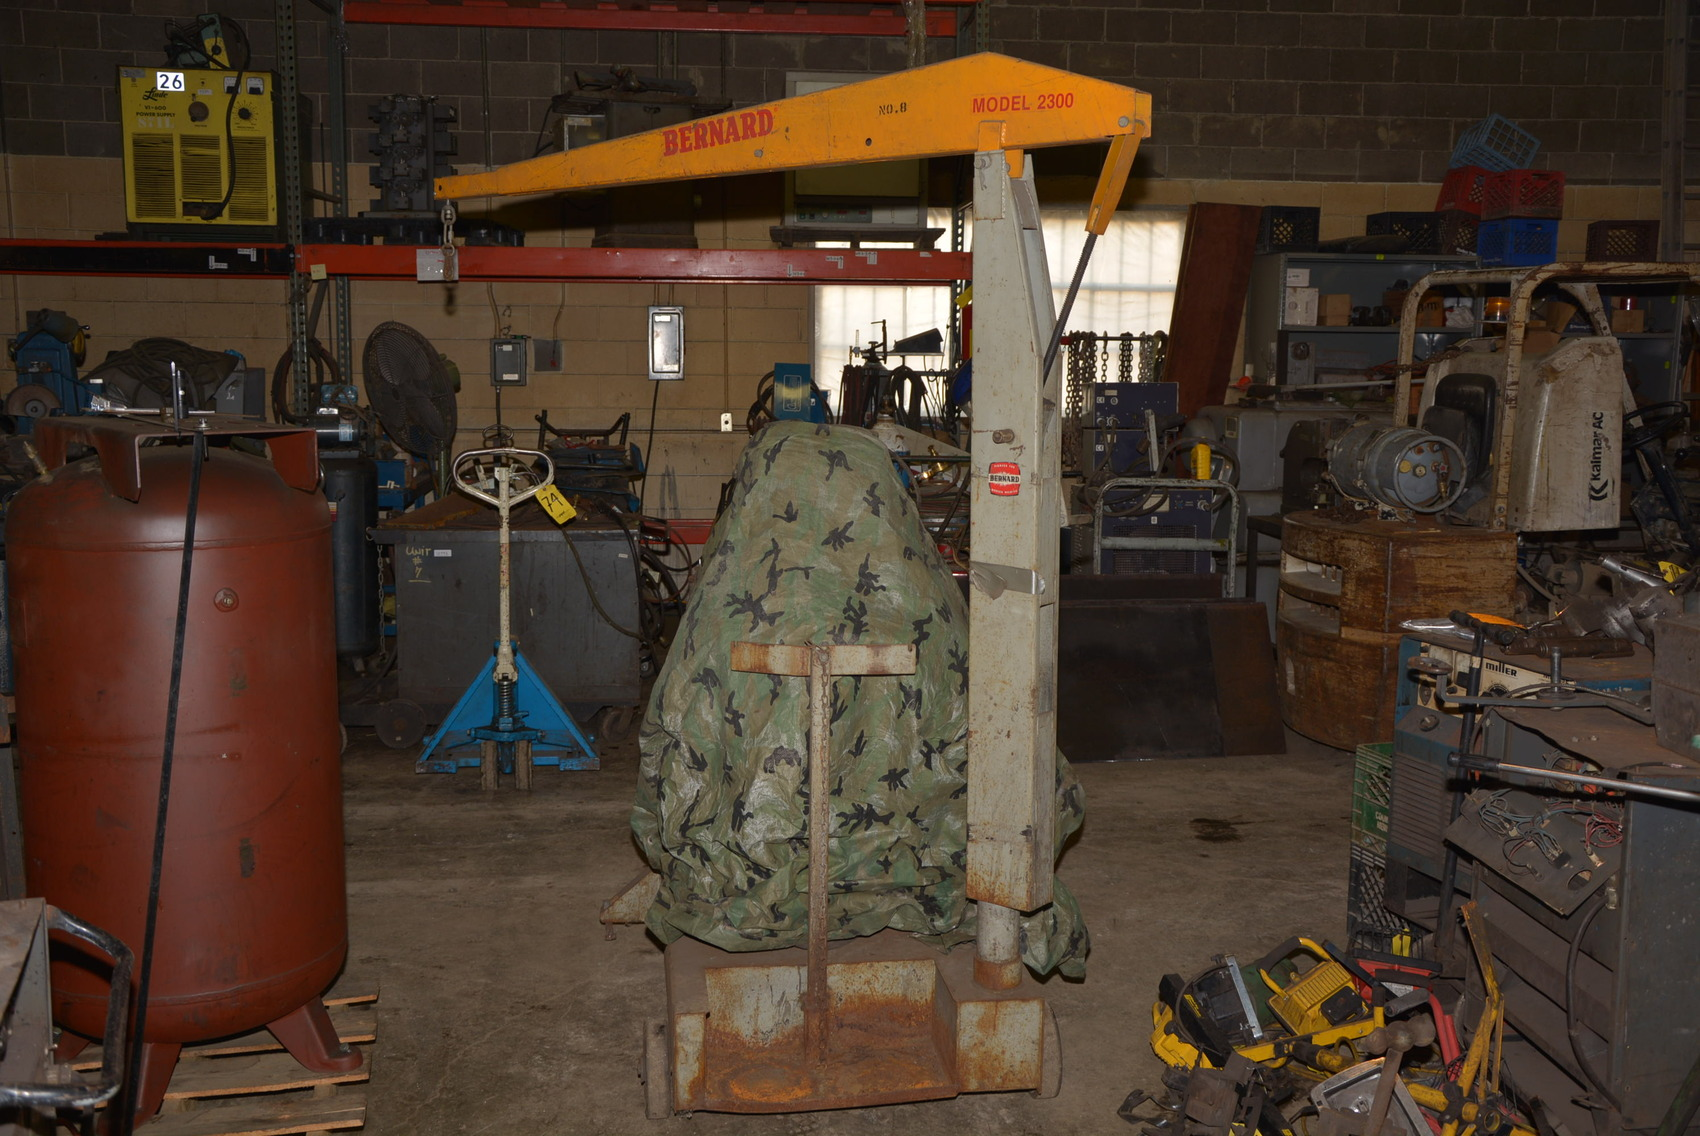 Mig Welder For Sale >> Bernard Model 2300 MIG Welding Boom Cart for Welder fabricator INV=13010